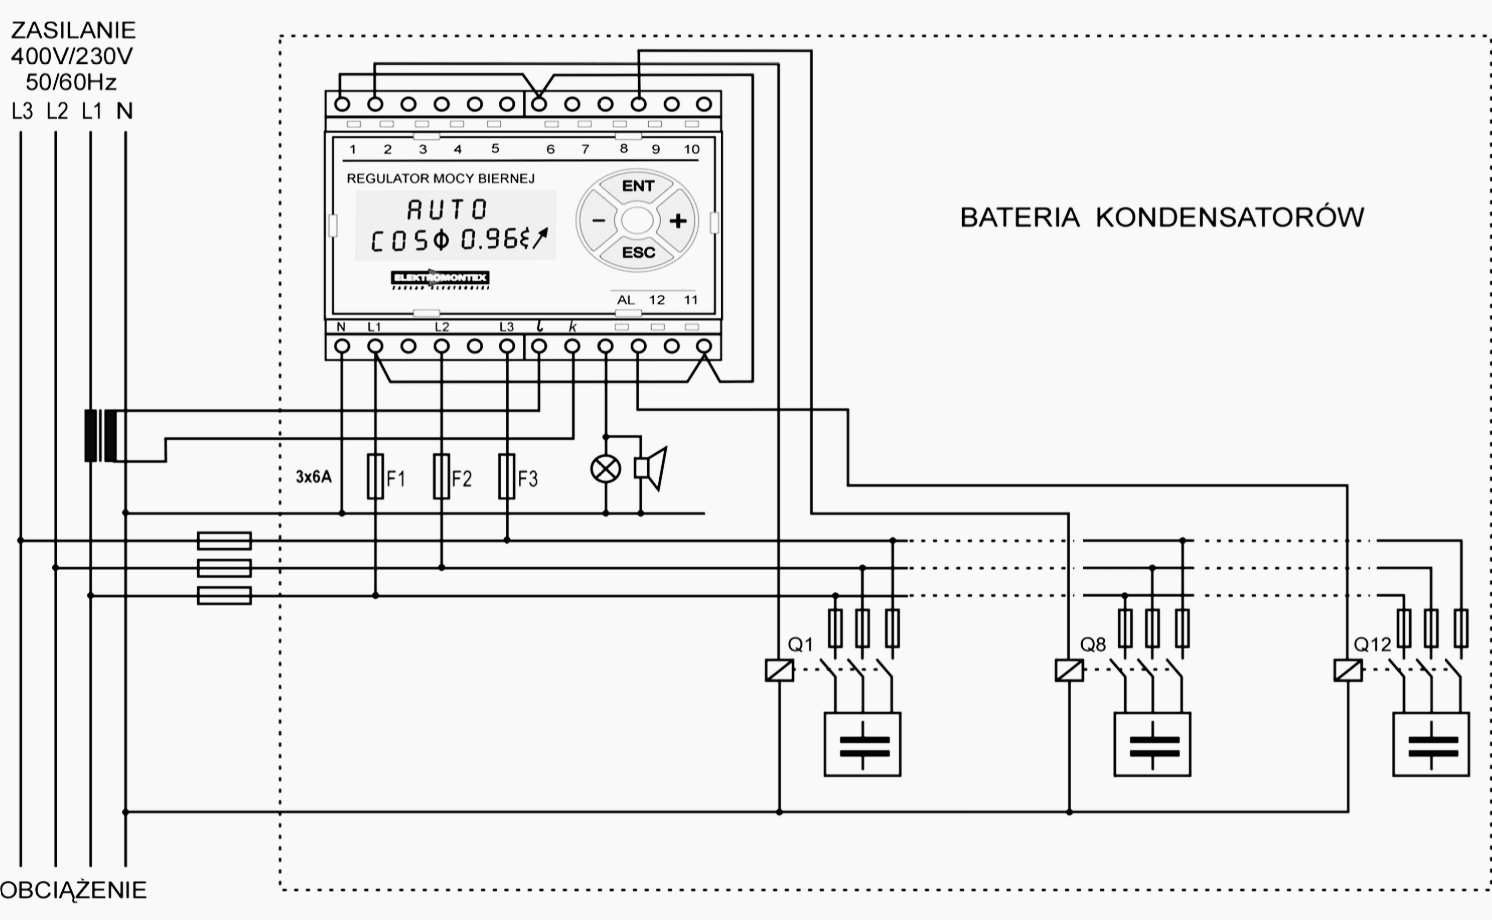 [EQHS_1162]  Capacitor Bank Control Wiring Diagram | Apfc Panel Wiring Diagram Pdf |  | Wiring Diagram